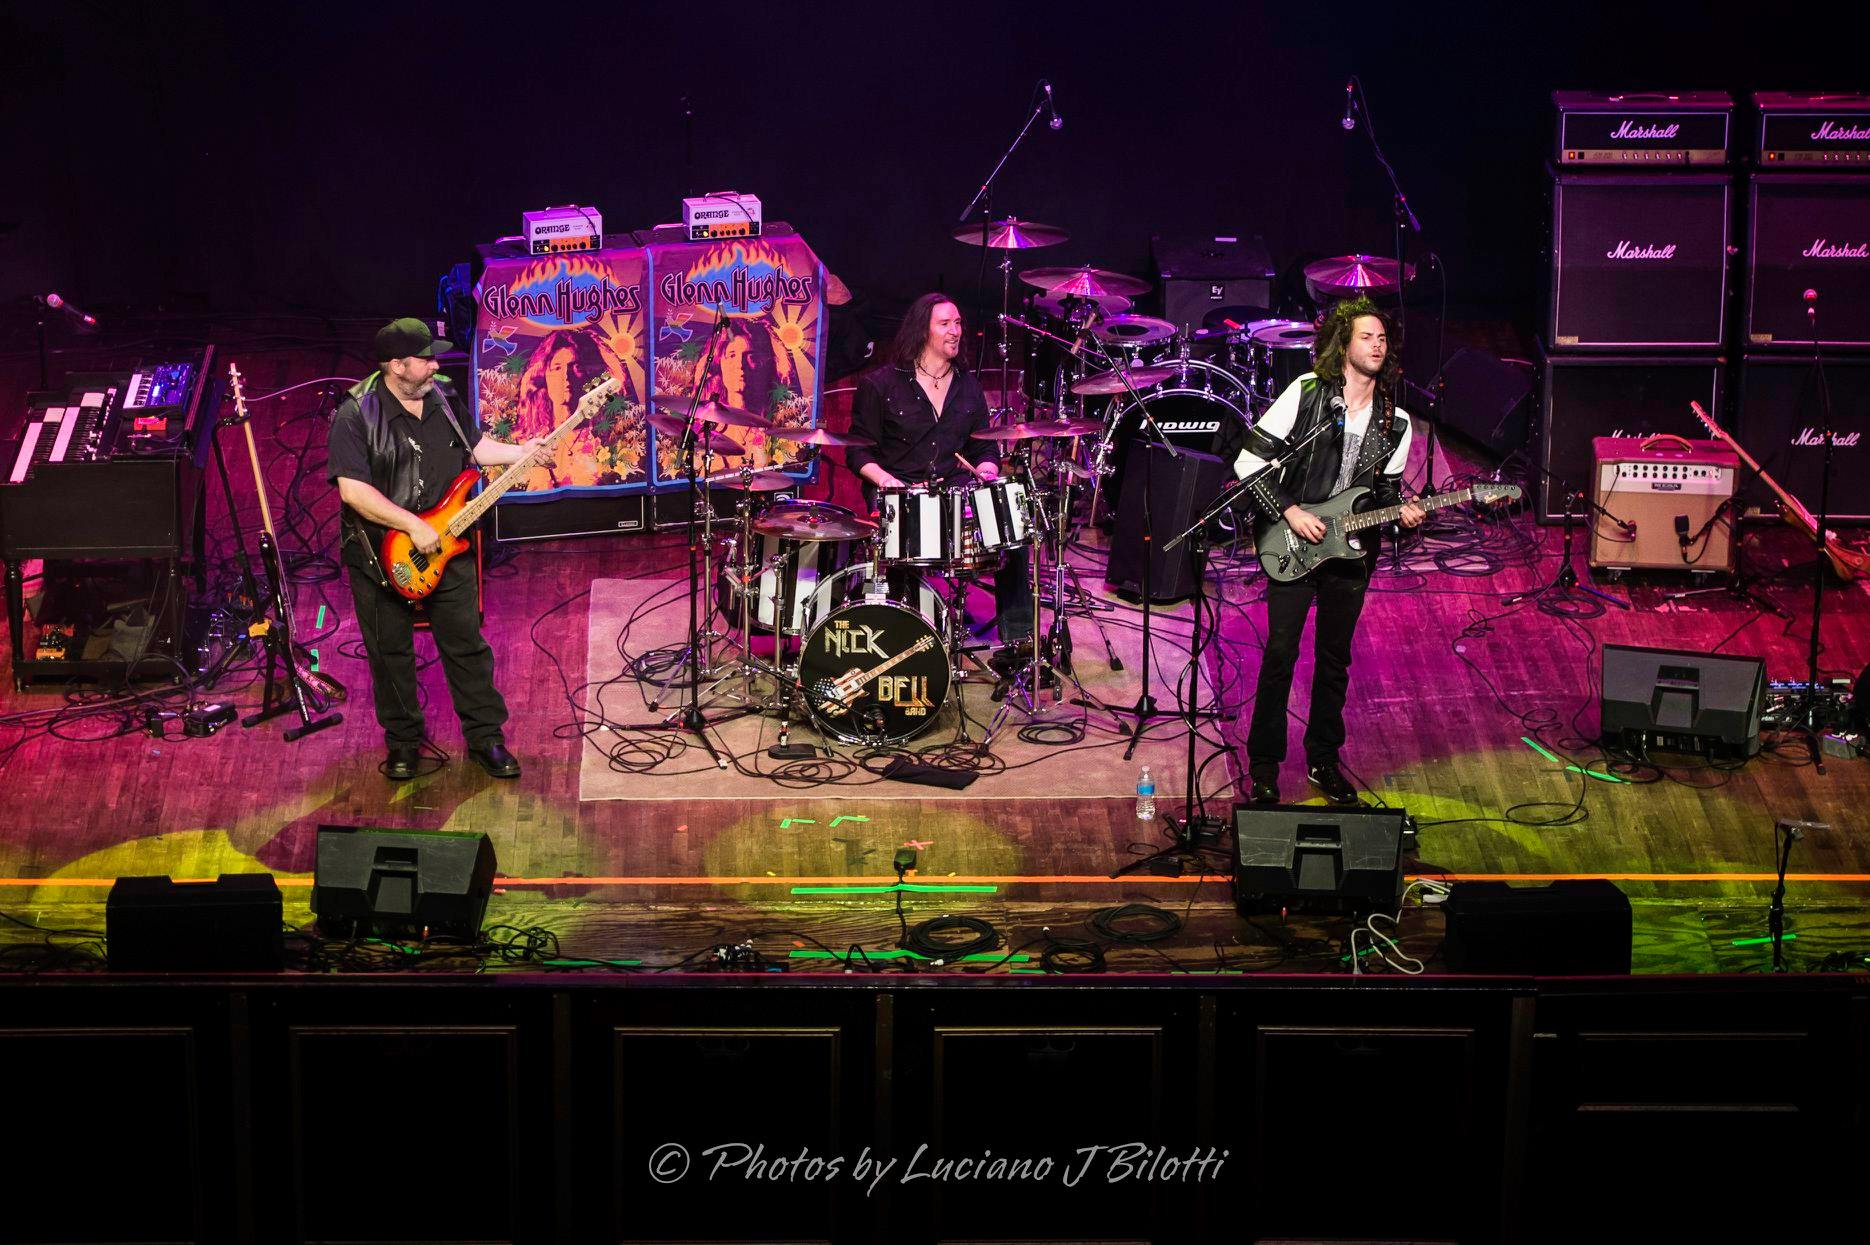 Nick Bell Band on support with Glenn Hughes of Deep Purple/Black Sabbath - 2019